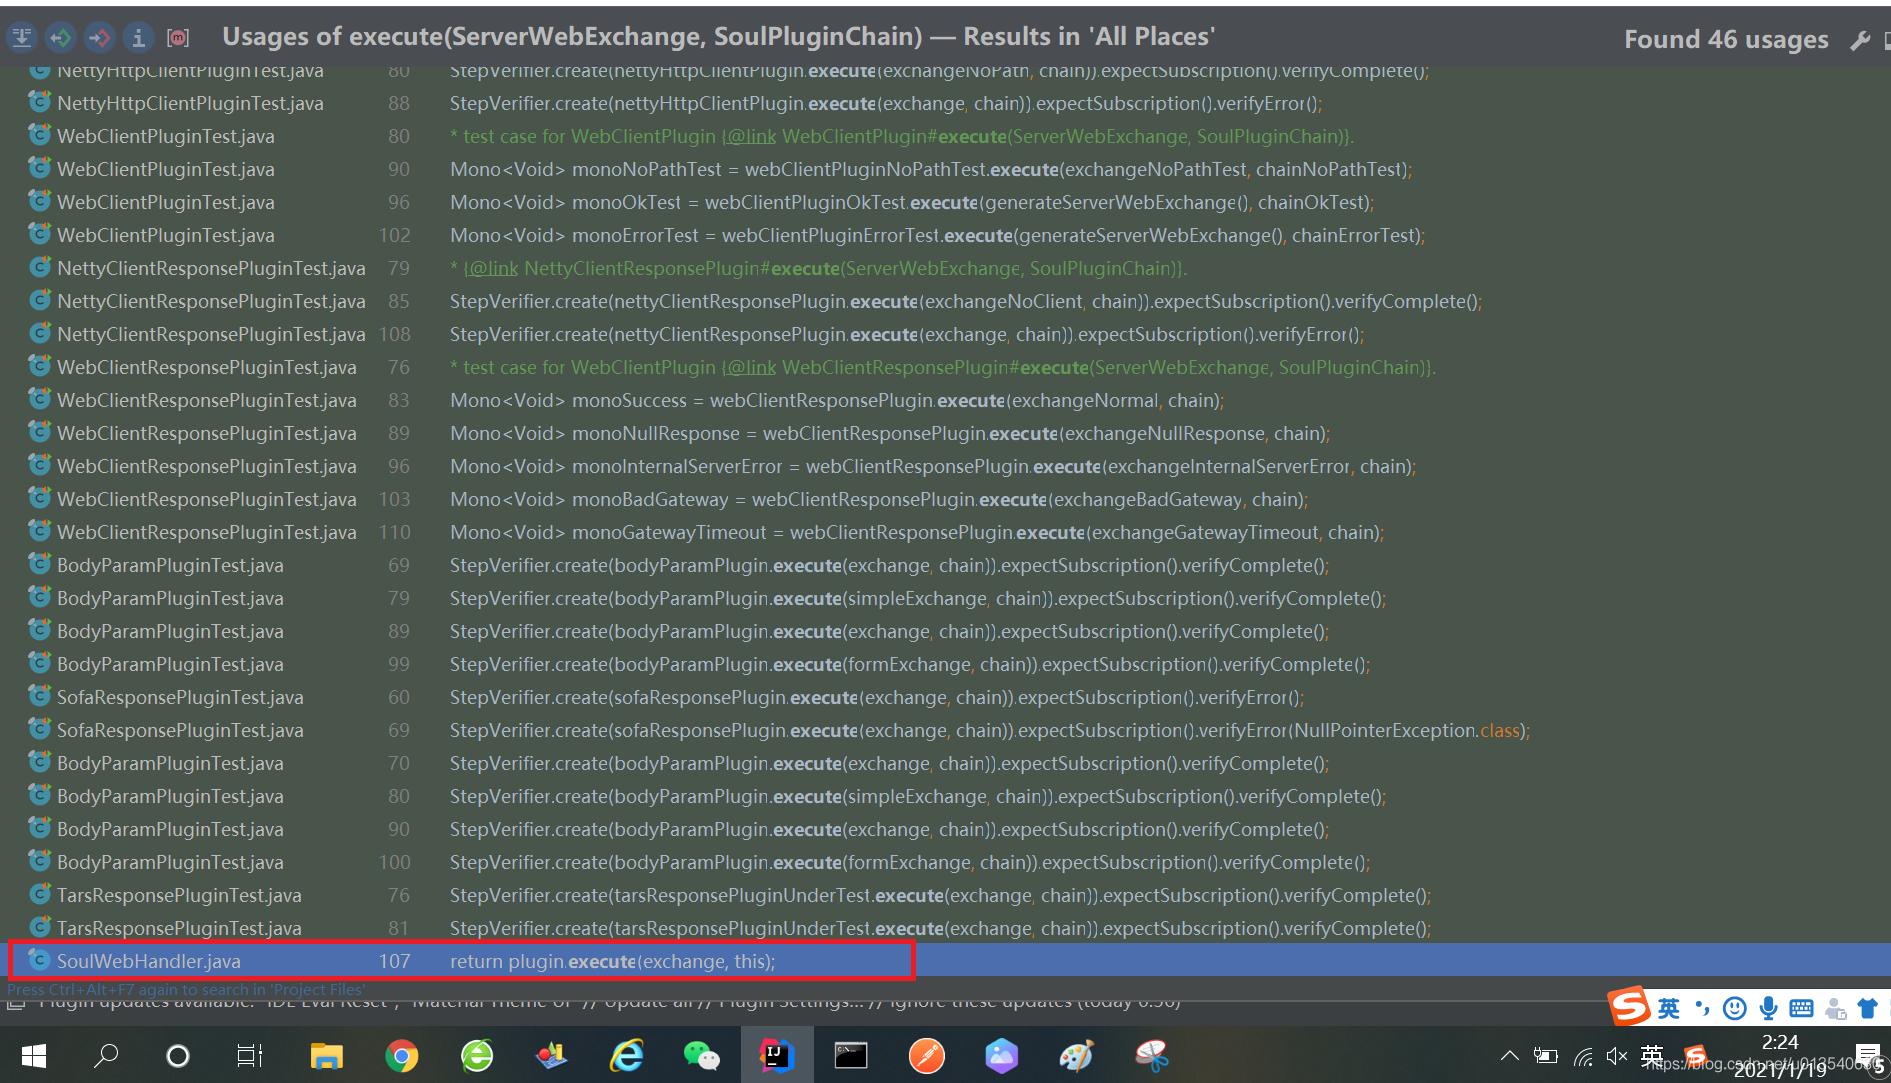 WebClientPlugin2